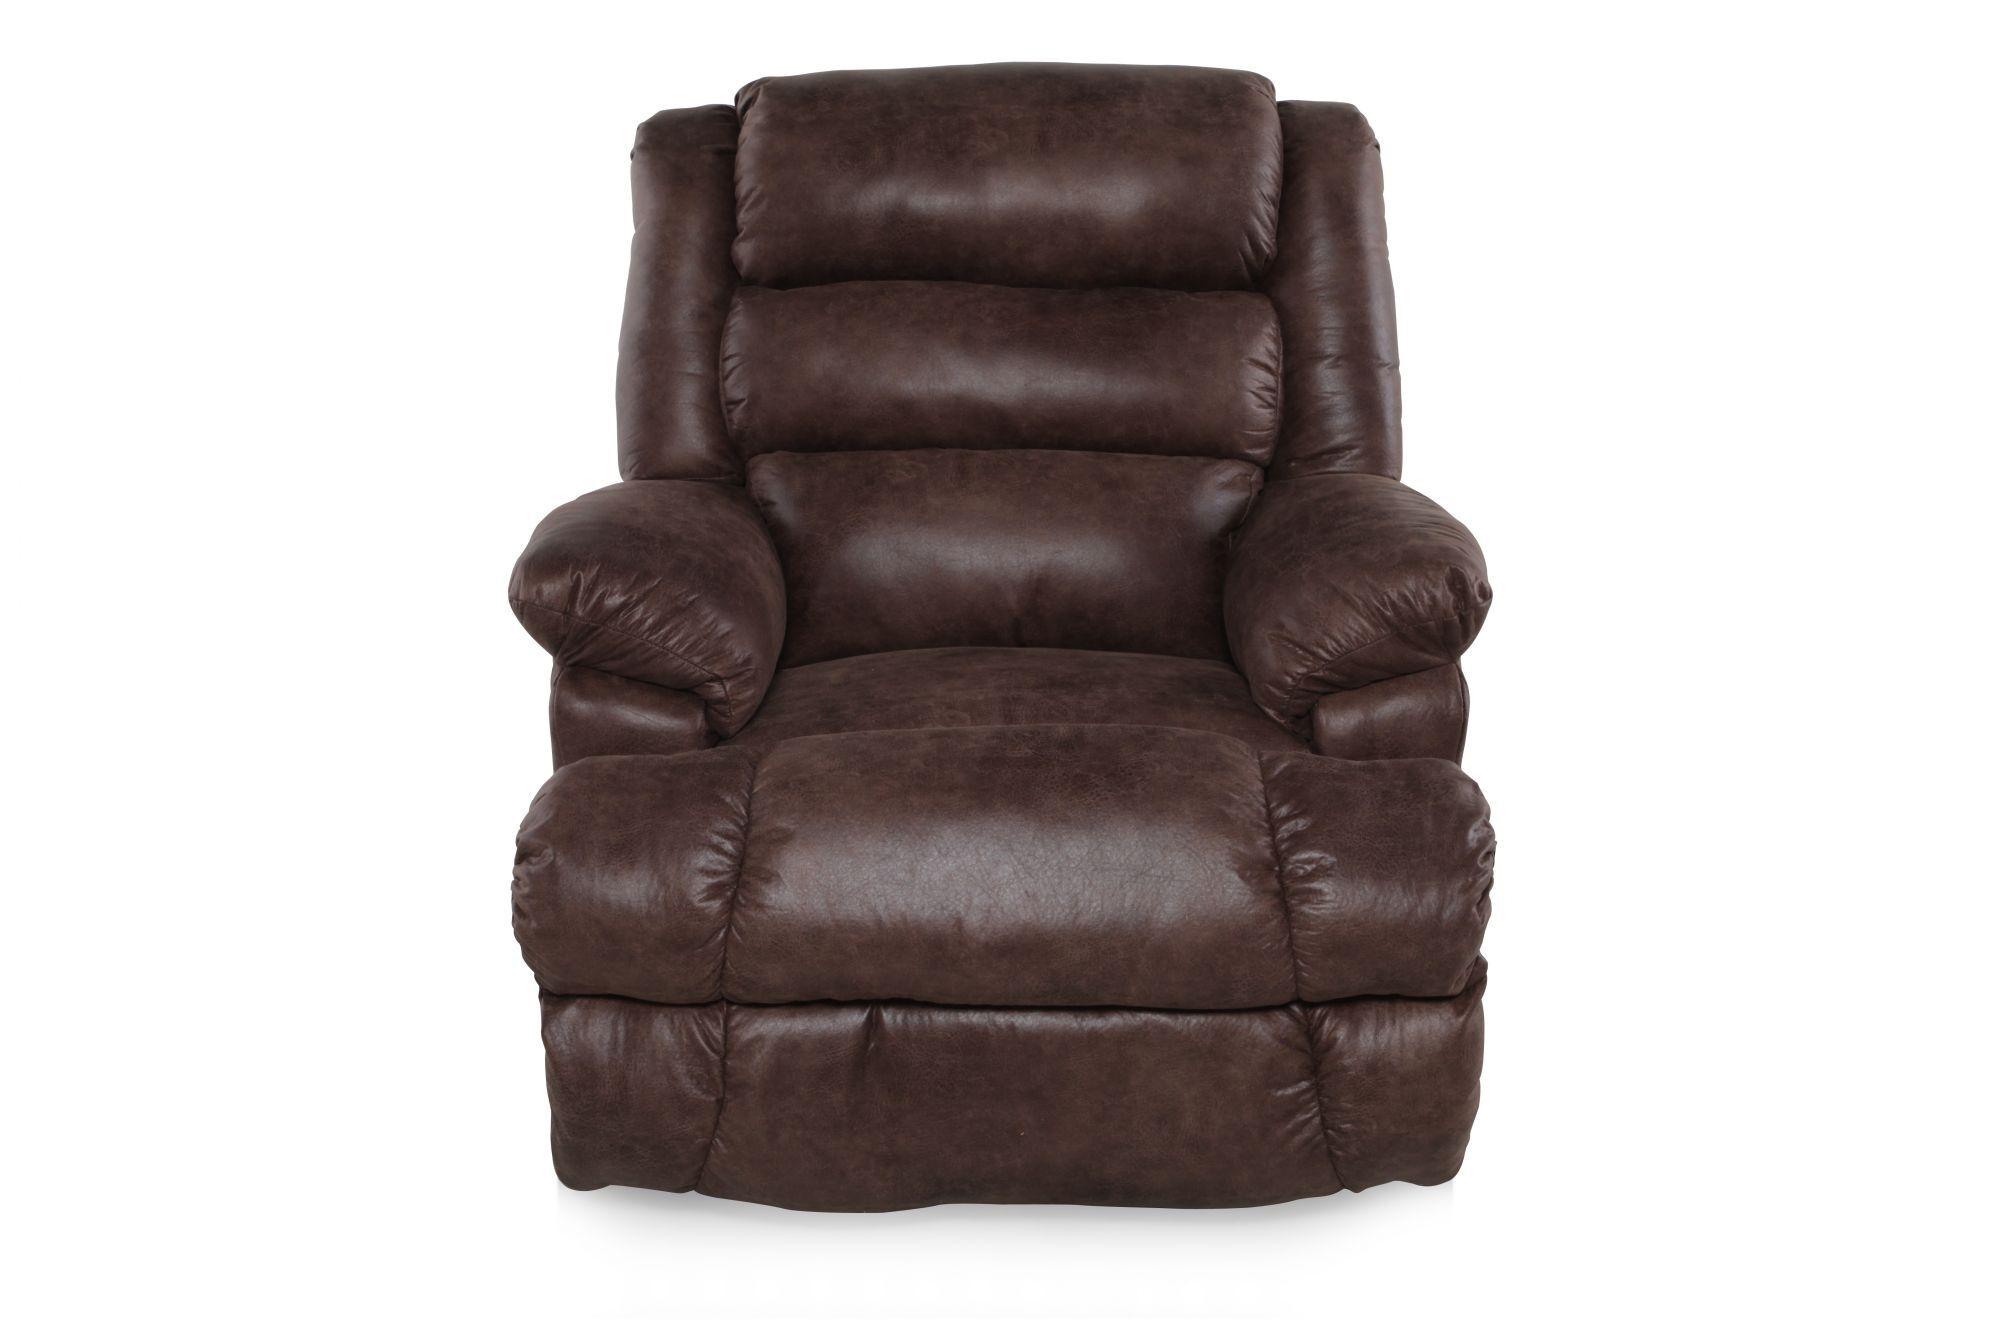 lane knox mocha rocker recliner